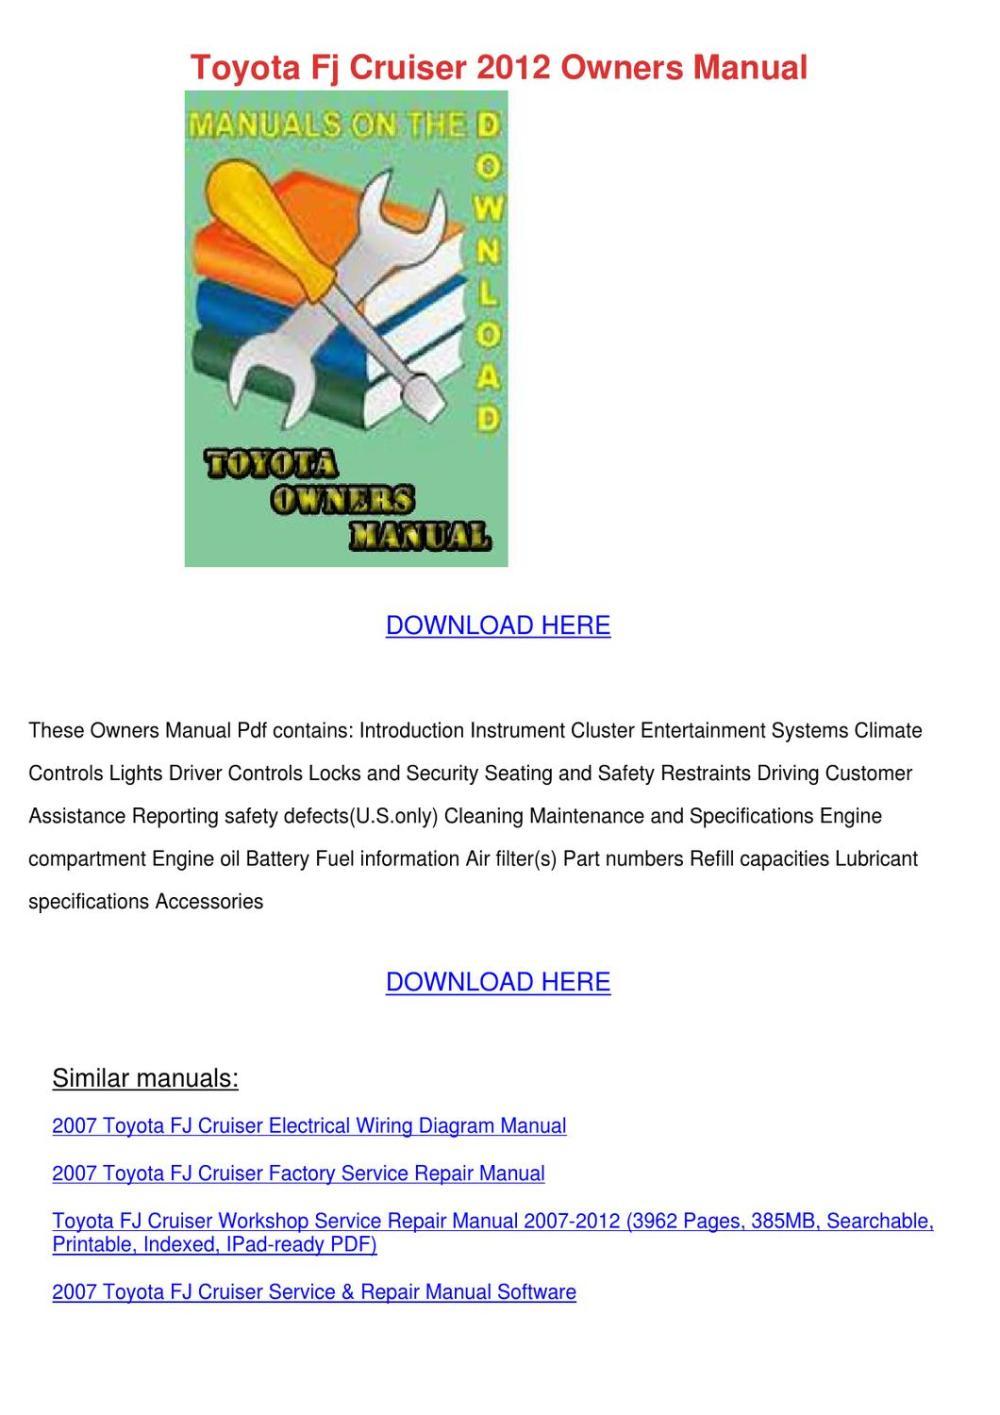 medium resolution of toyota fj cruiser 2012 owners manual